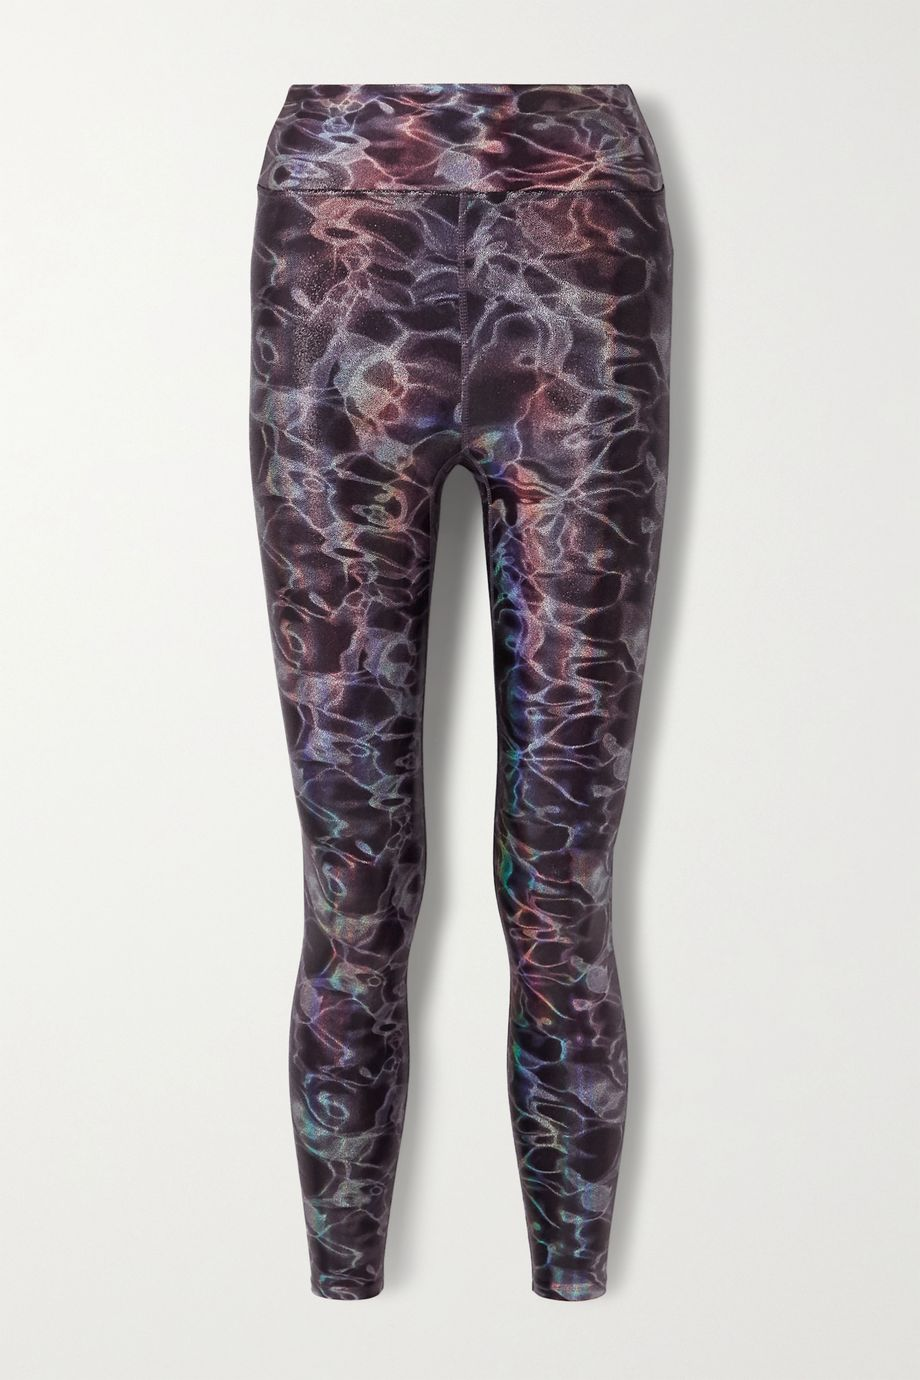 Heroine Sport Marvel metallic printed stretch leggings